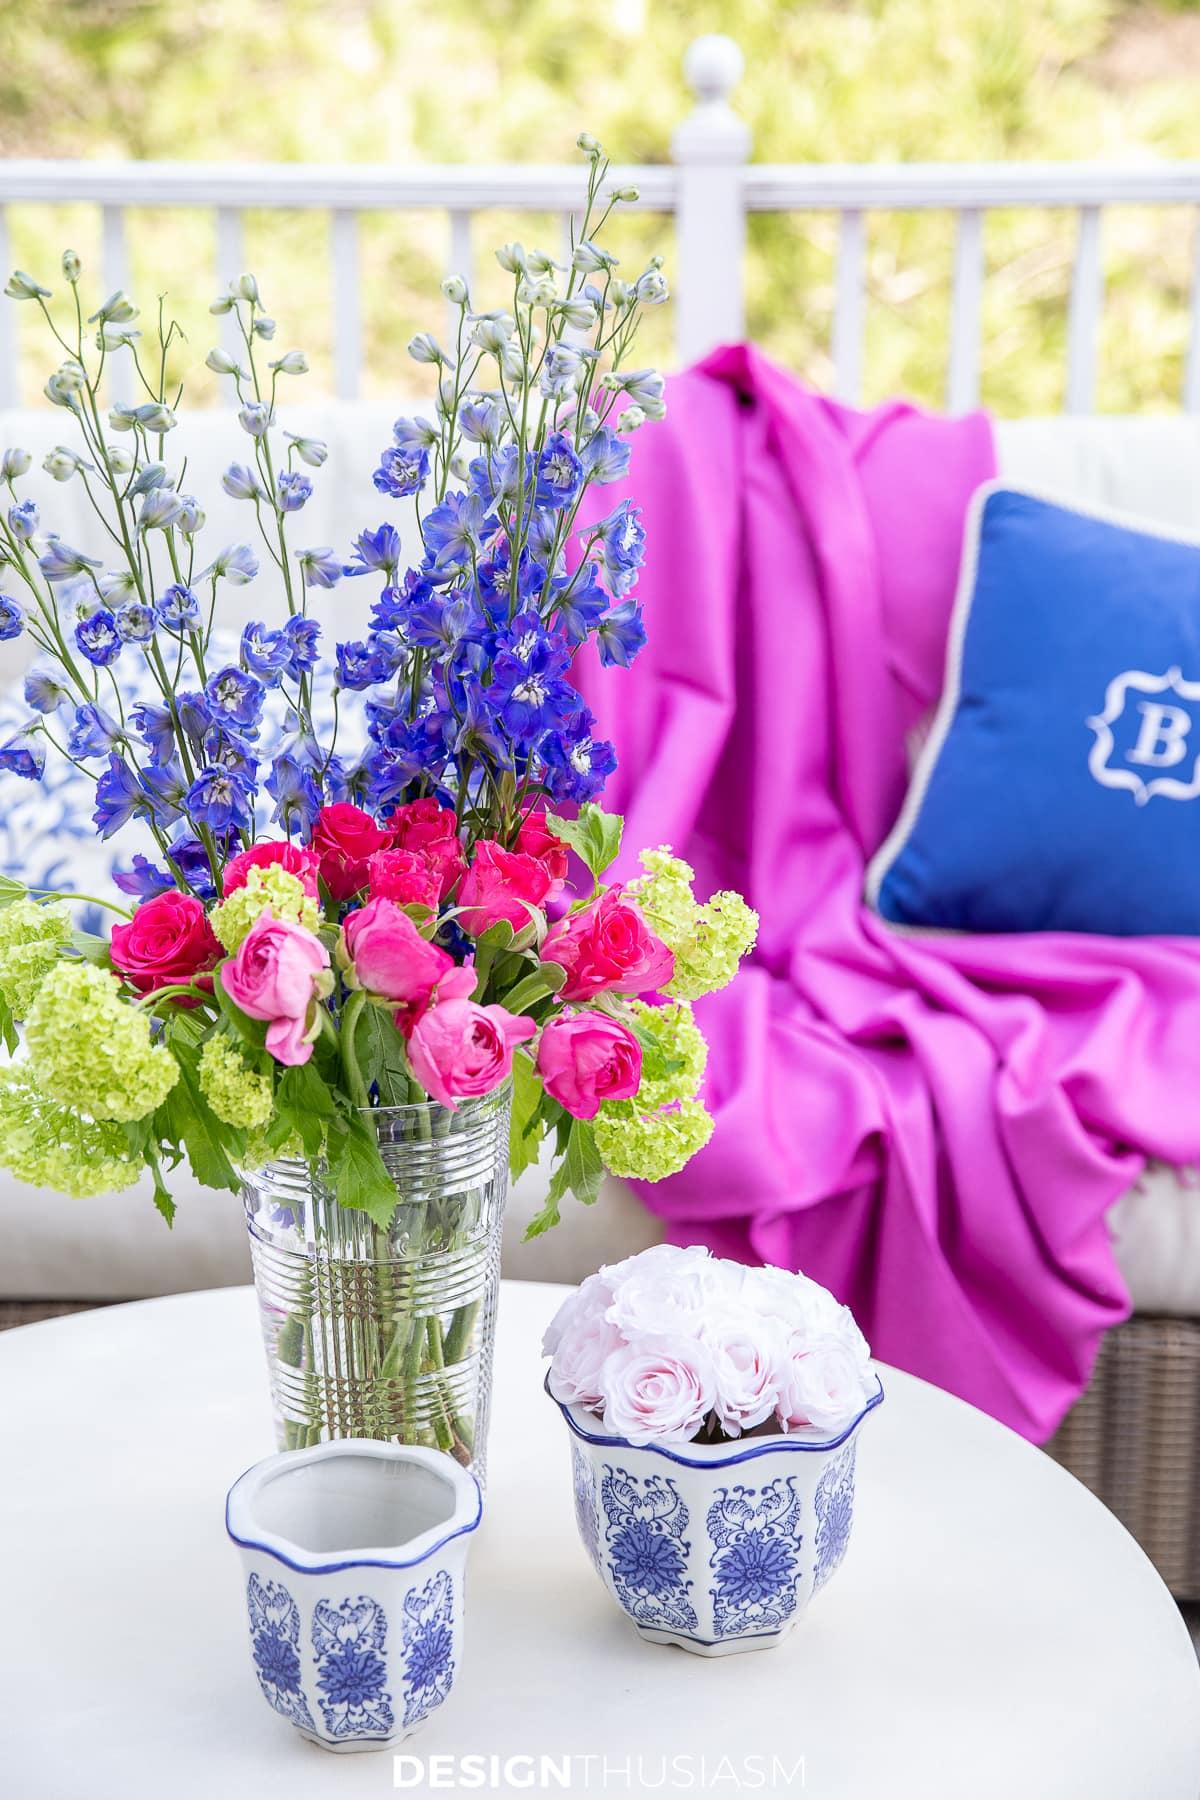 Patio Decor Ideas: Using Color to Refresh a Small Backyard Patio Deck